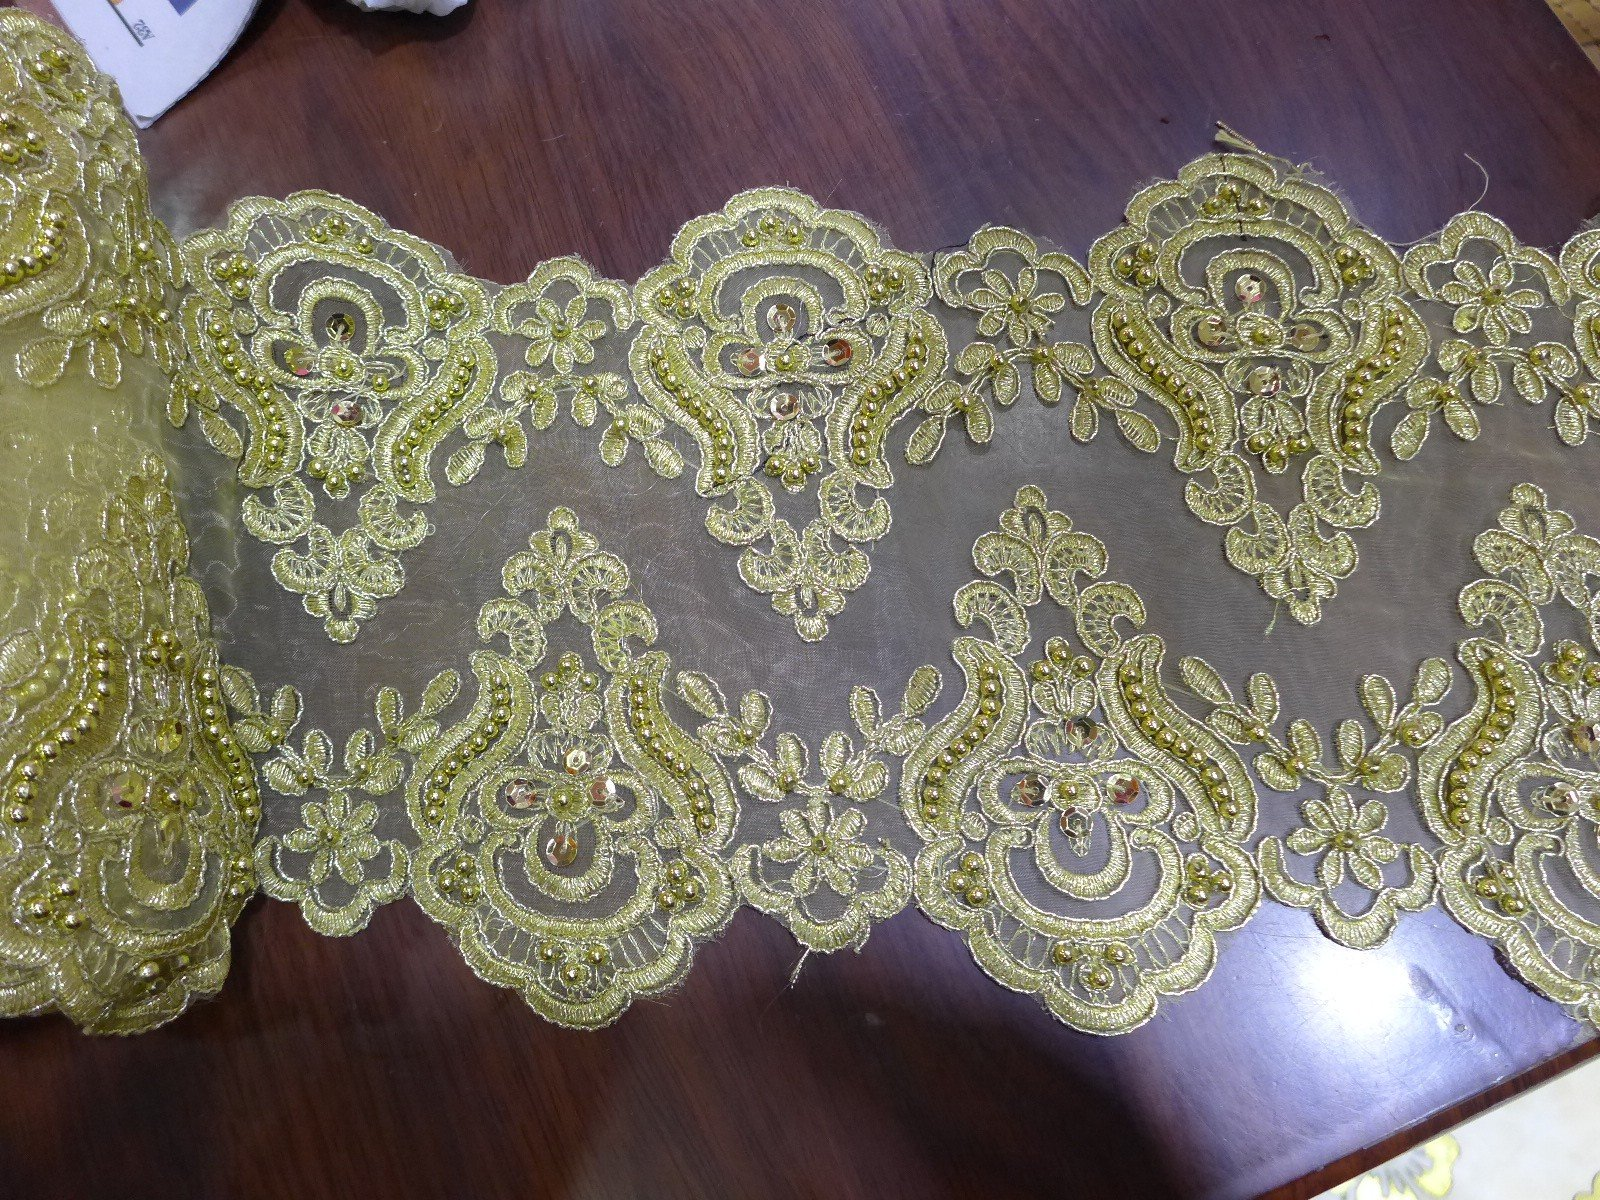 Bridal Wedding Dress Belts Leaf Metallic Embroidered Venise Lace Trim #294